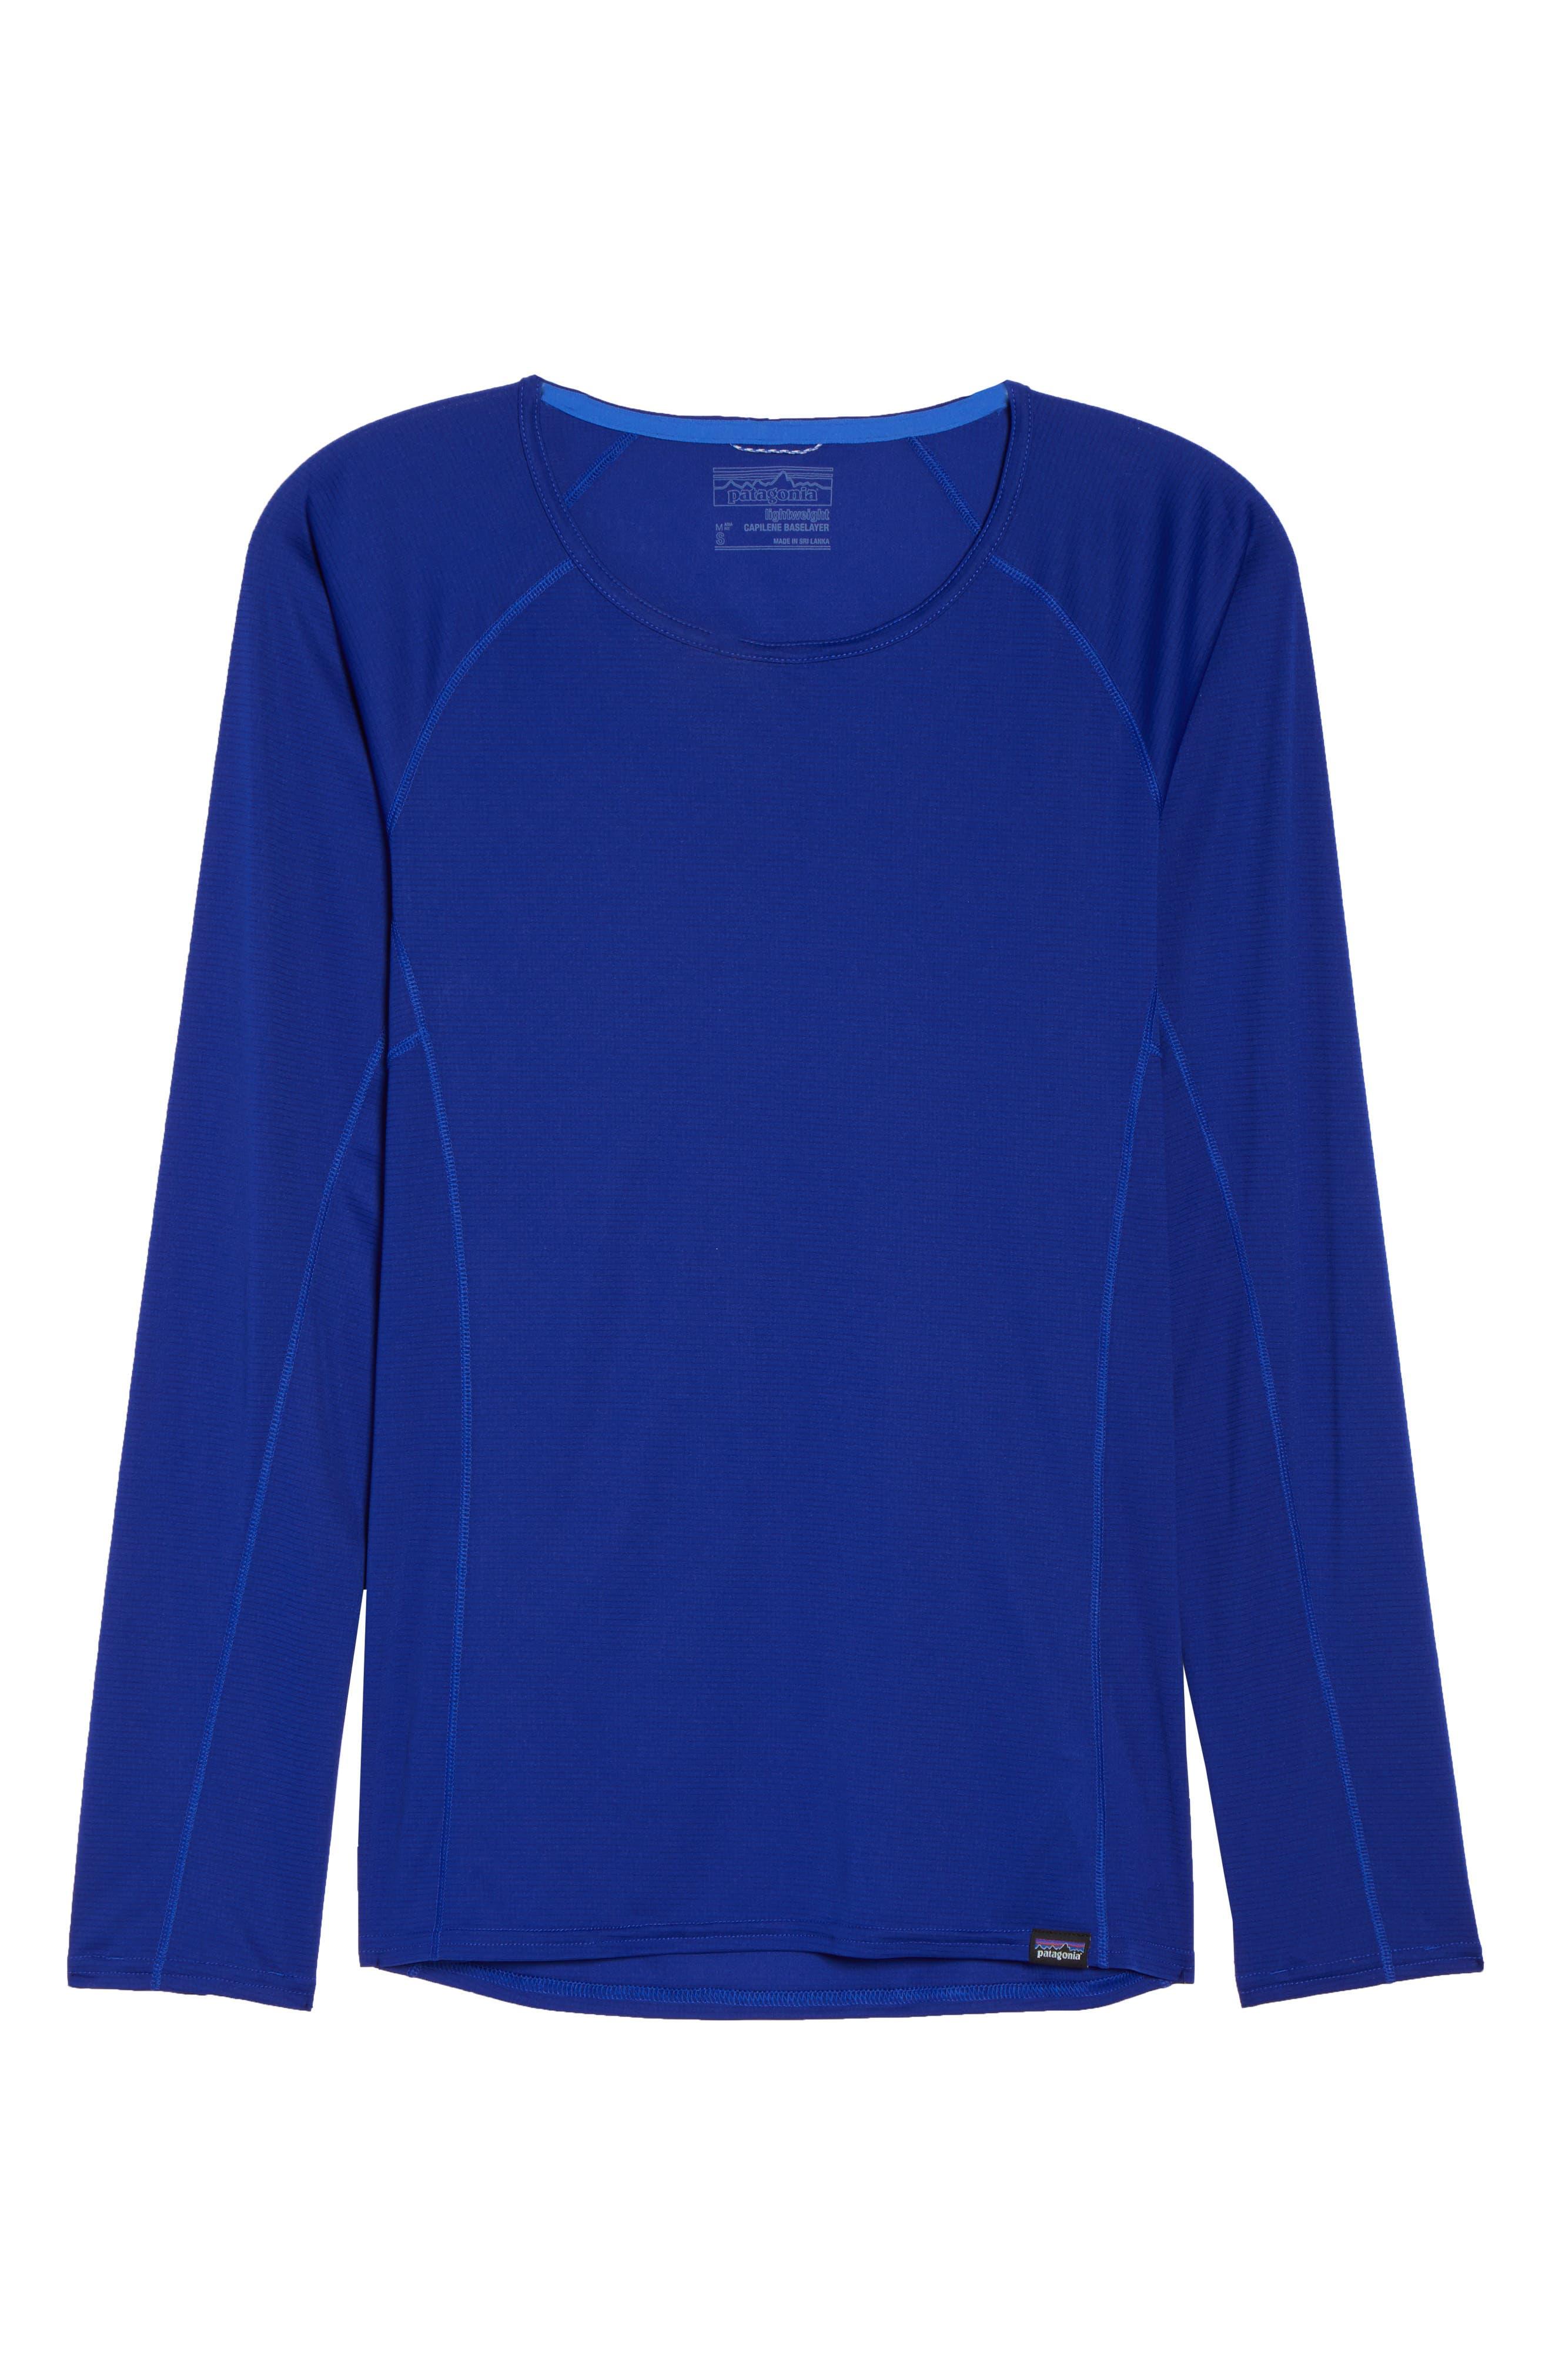 Lightweight Capilene<sup>®</sup> Long-Sleeve Tee,                             Alternate thumbnail 6, color,                             Cobalt Blue